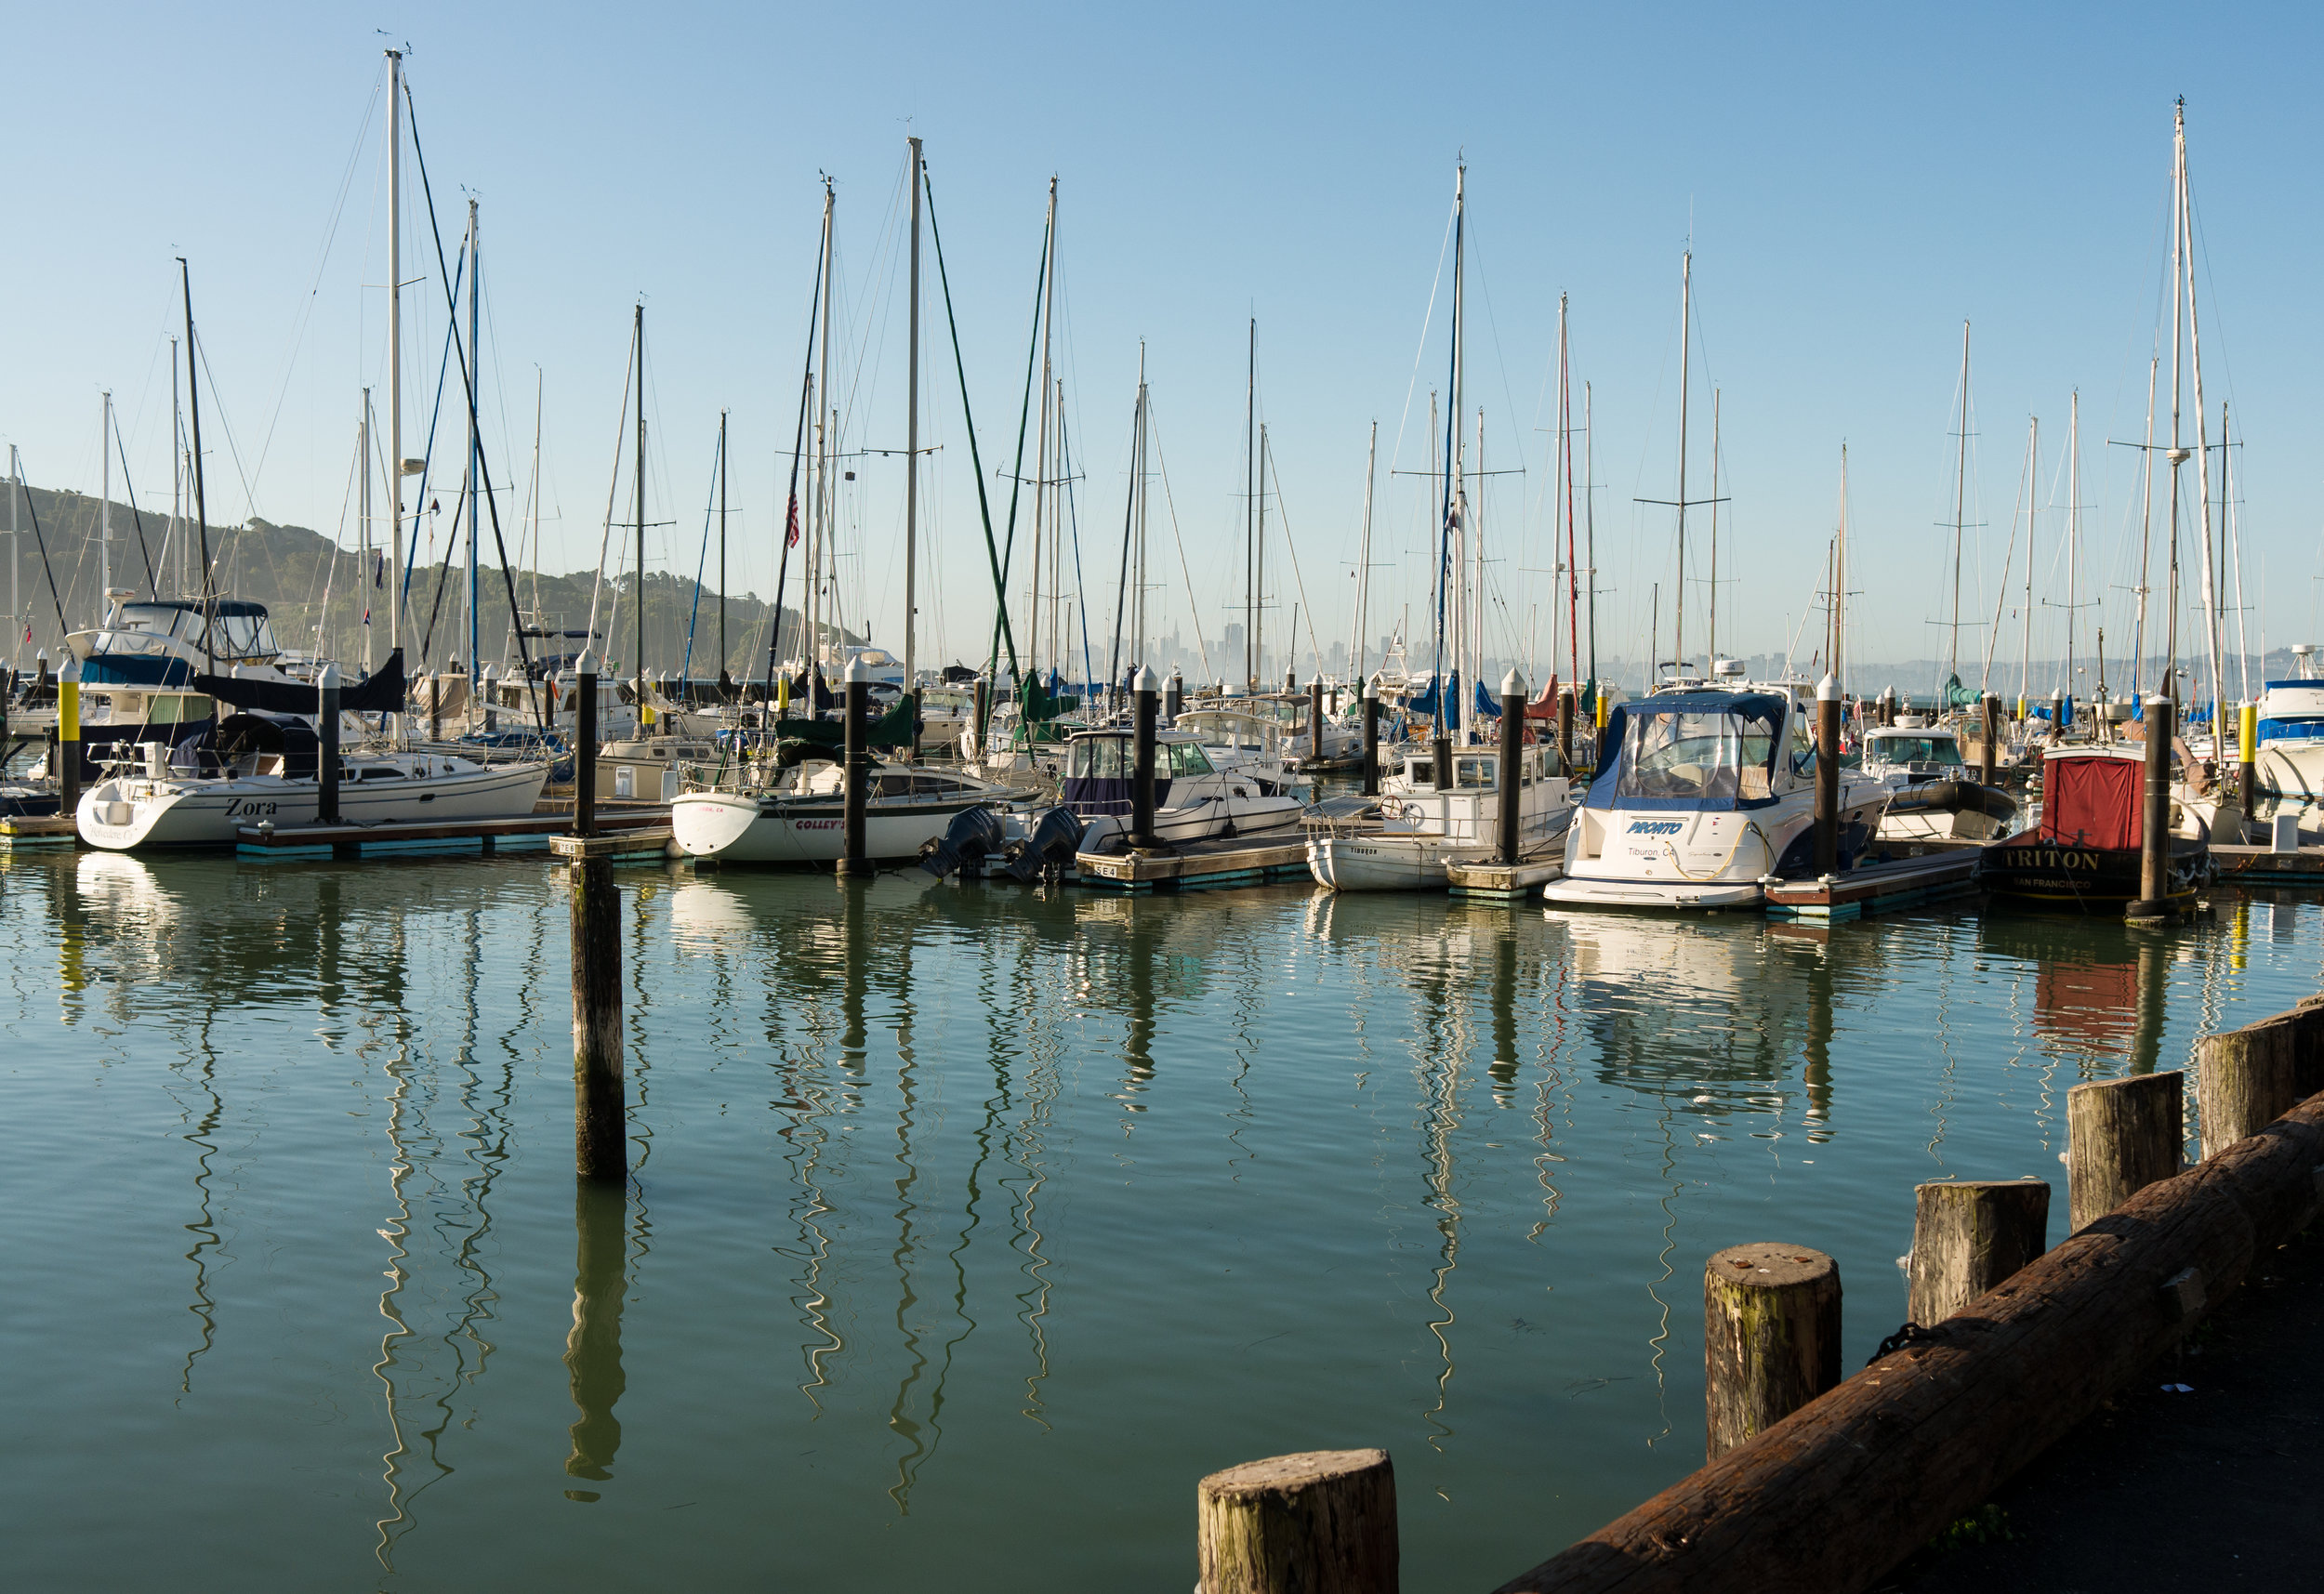 Corinthian_Yacht_Club_Tiburon.jpg